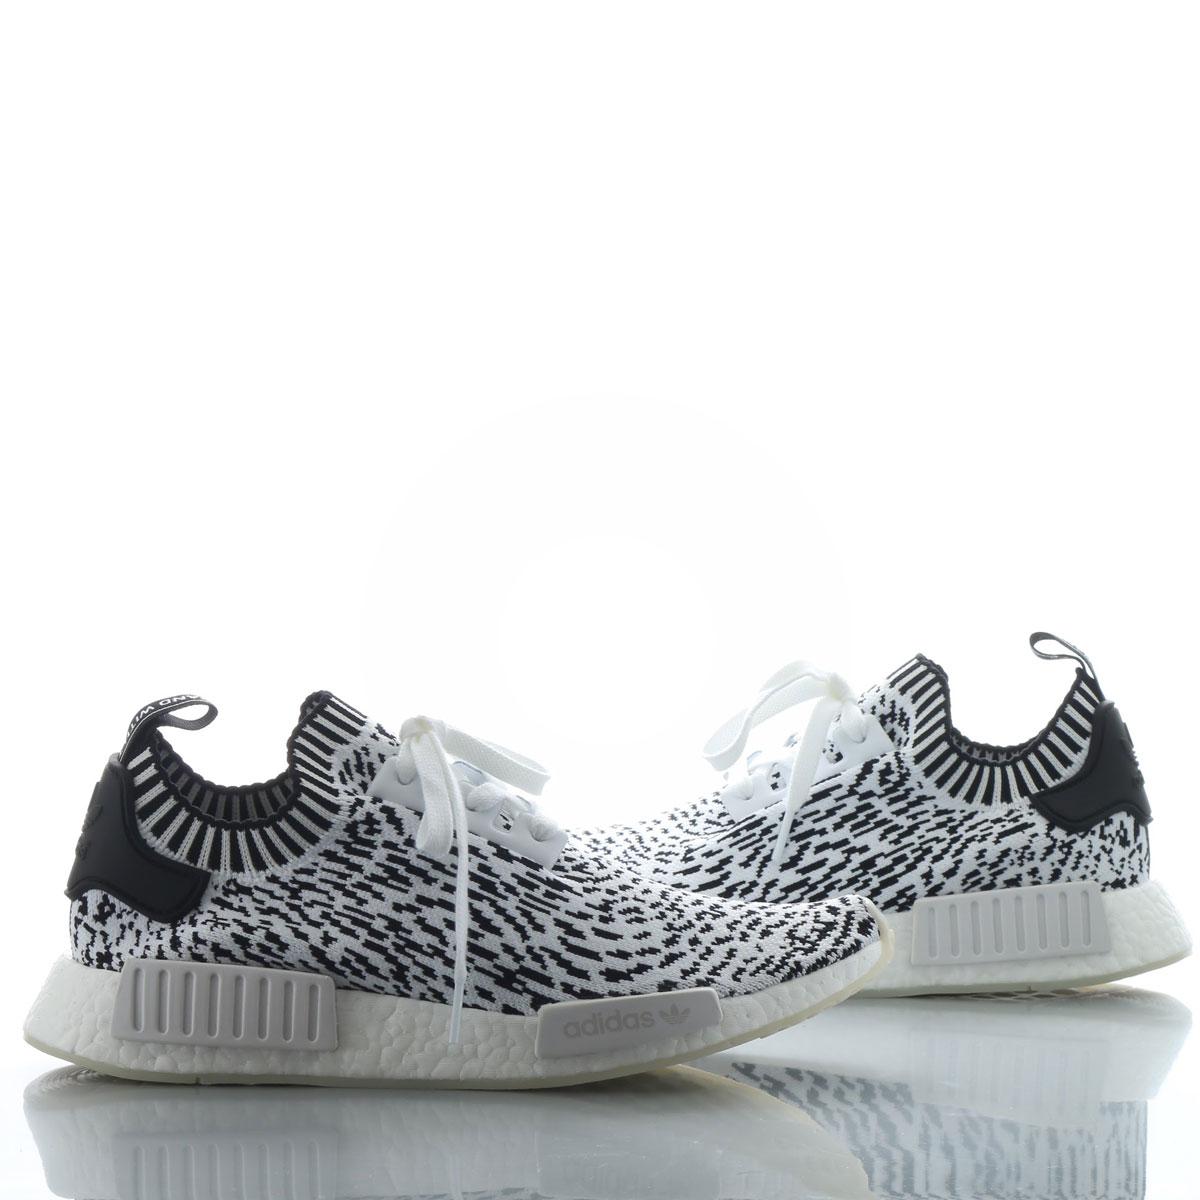 adidas Originals NMD_R1 PK (アディダス オリジナルス NMD_R1 PK) RUNNING WHITE/RUNNING WHITE/CORE BLACK【メンズ スニーカー】17FW-S